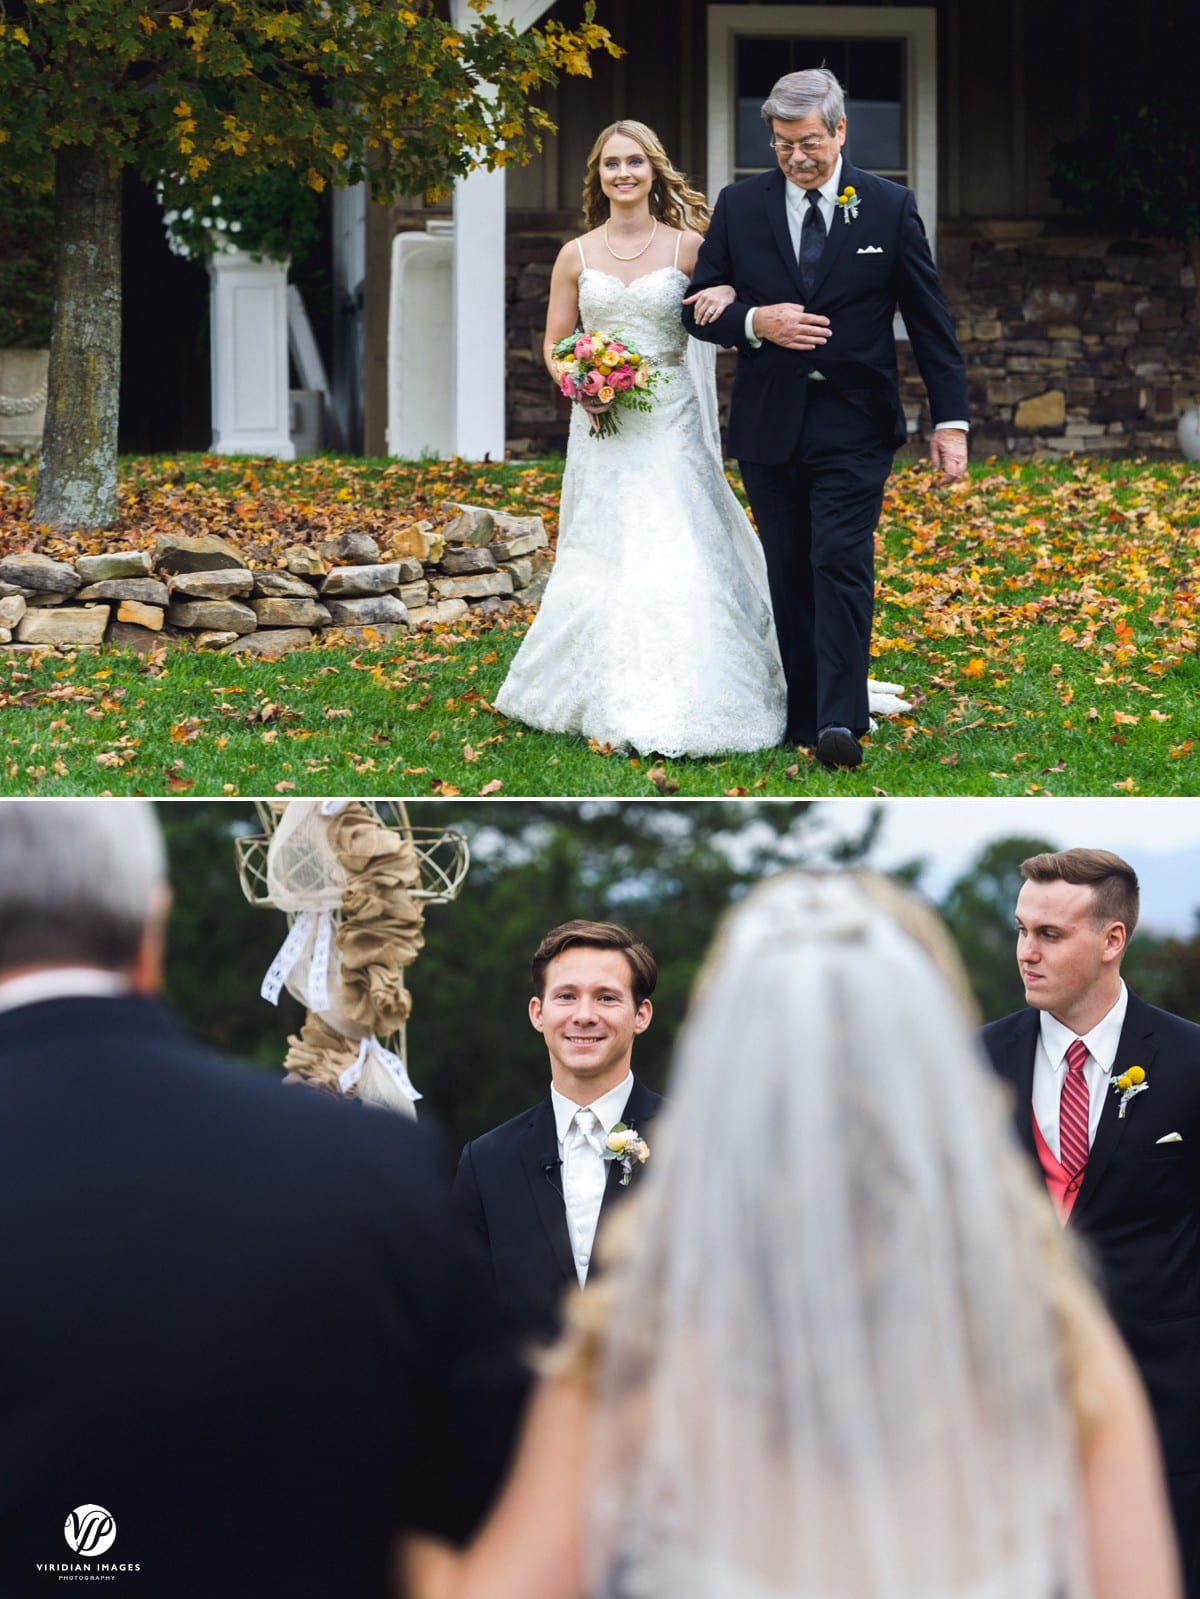 Bride and father walking down aisle Walnut Hill Farm Dalton GA